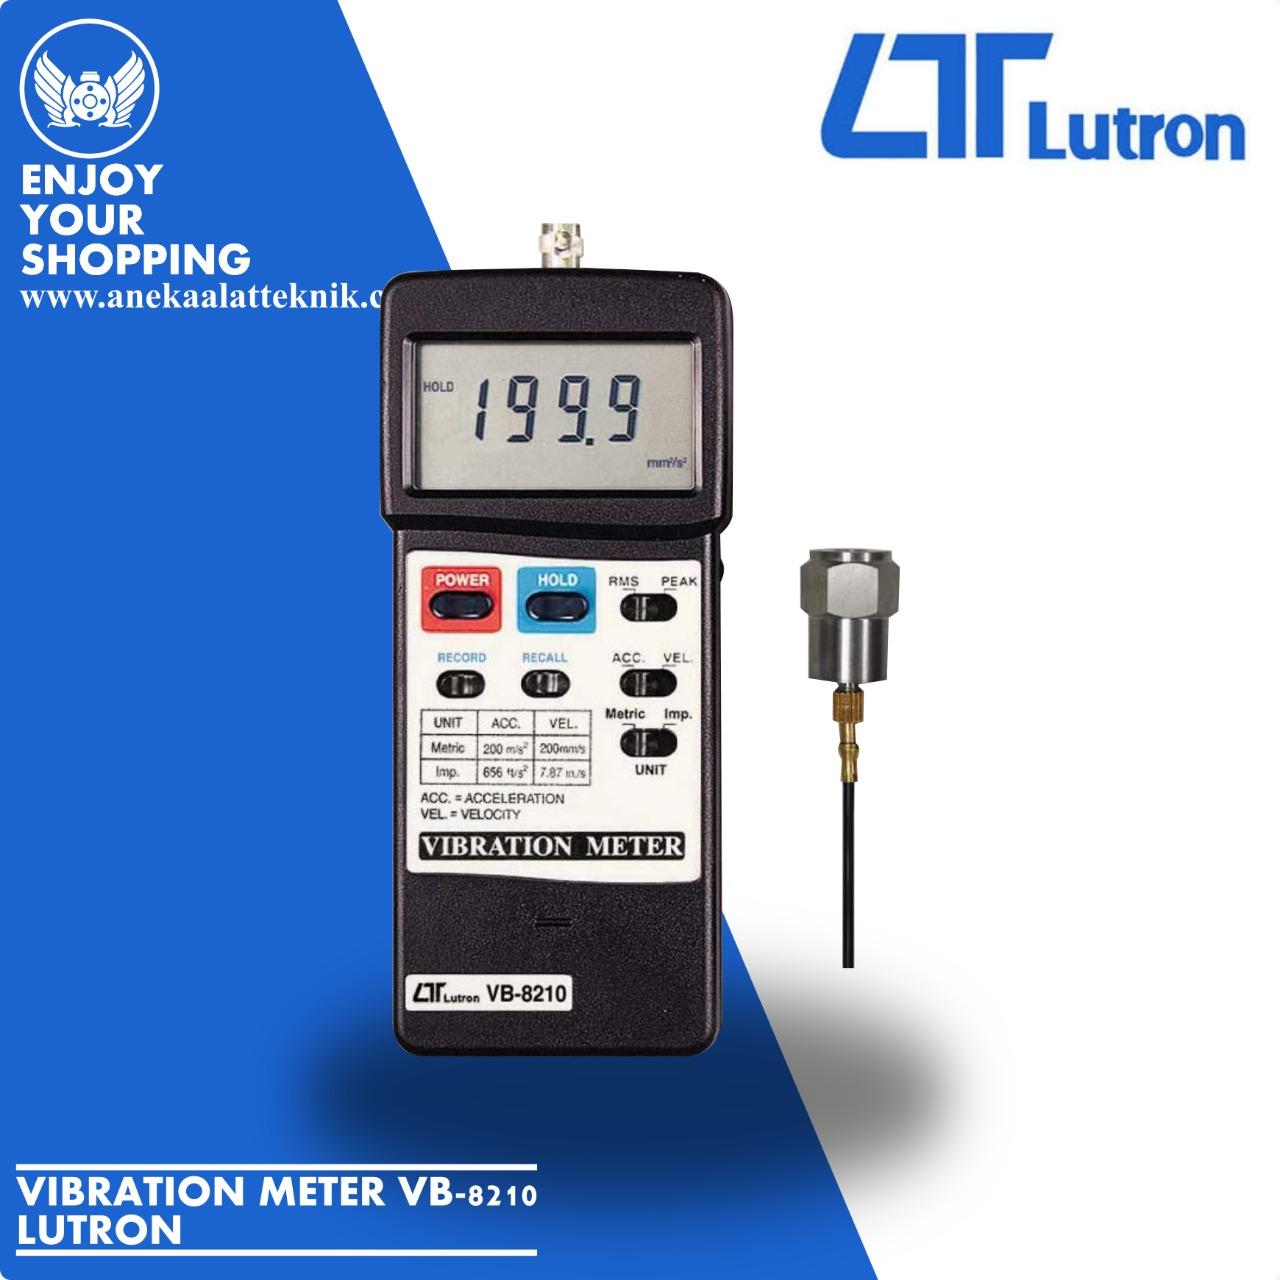 Vibration meter Lutron VB 8210